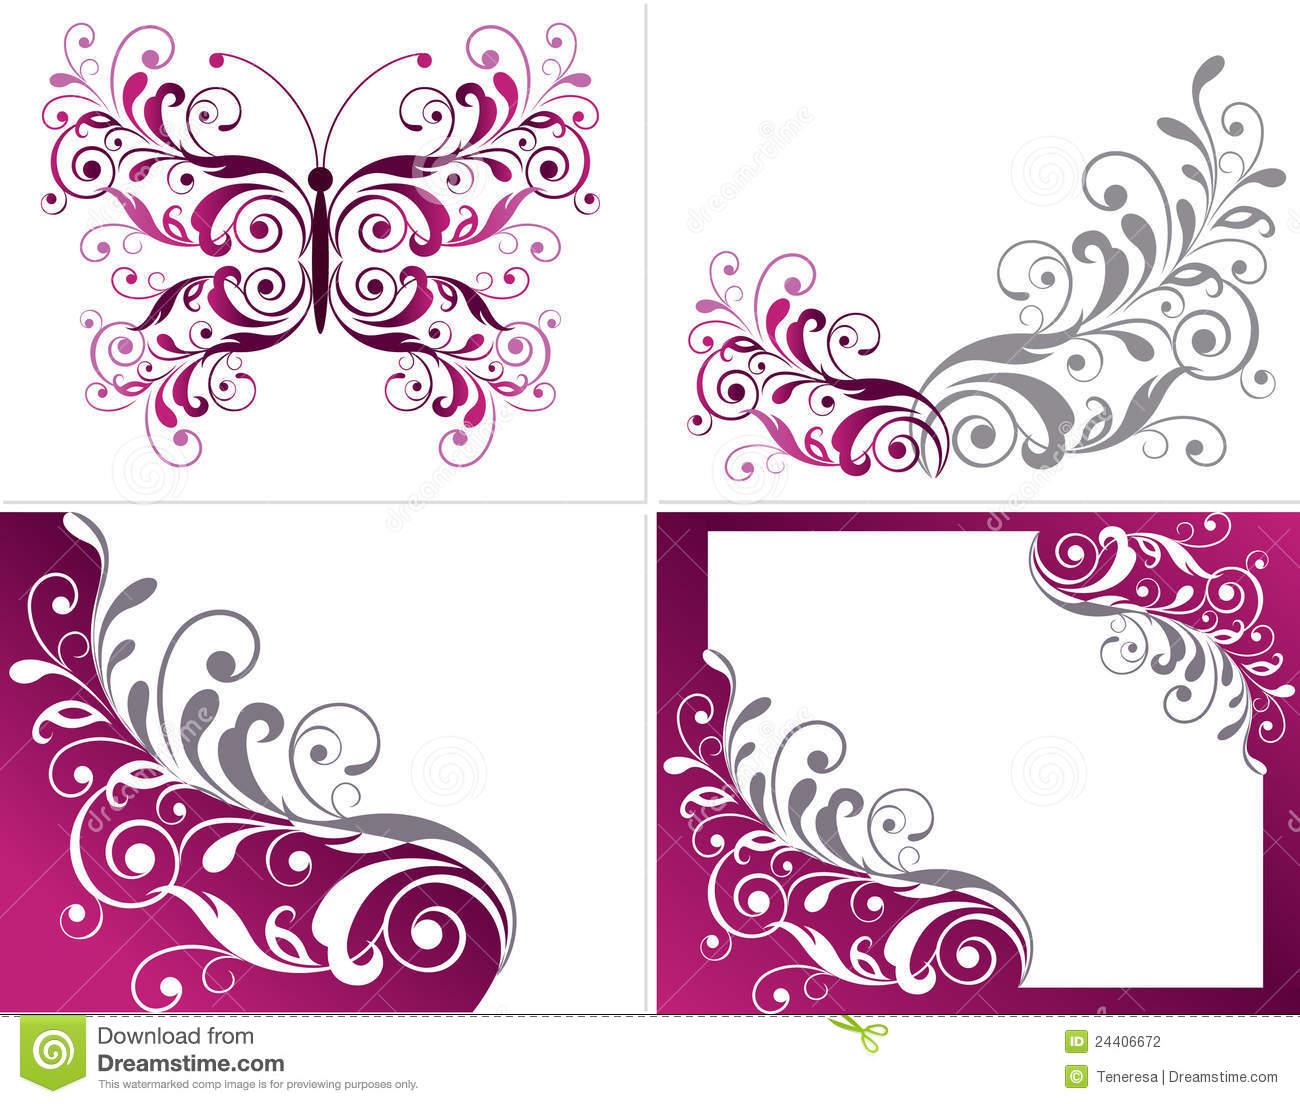 Floral graphic designs clip art Floral Graphics Design Elements Stock Photography - Image: 24406672 clip art